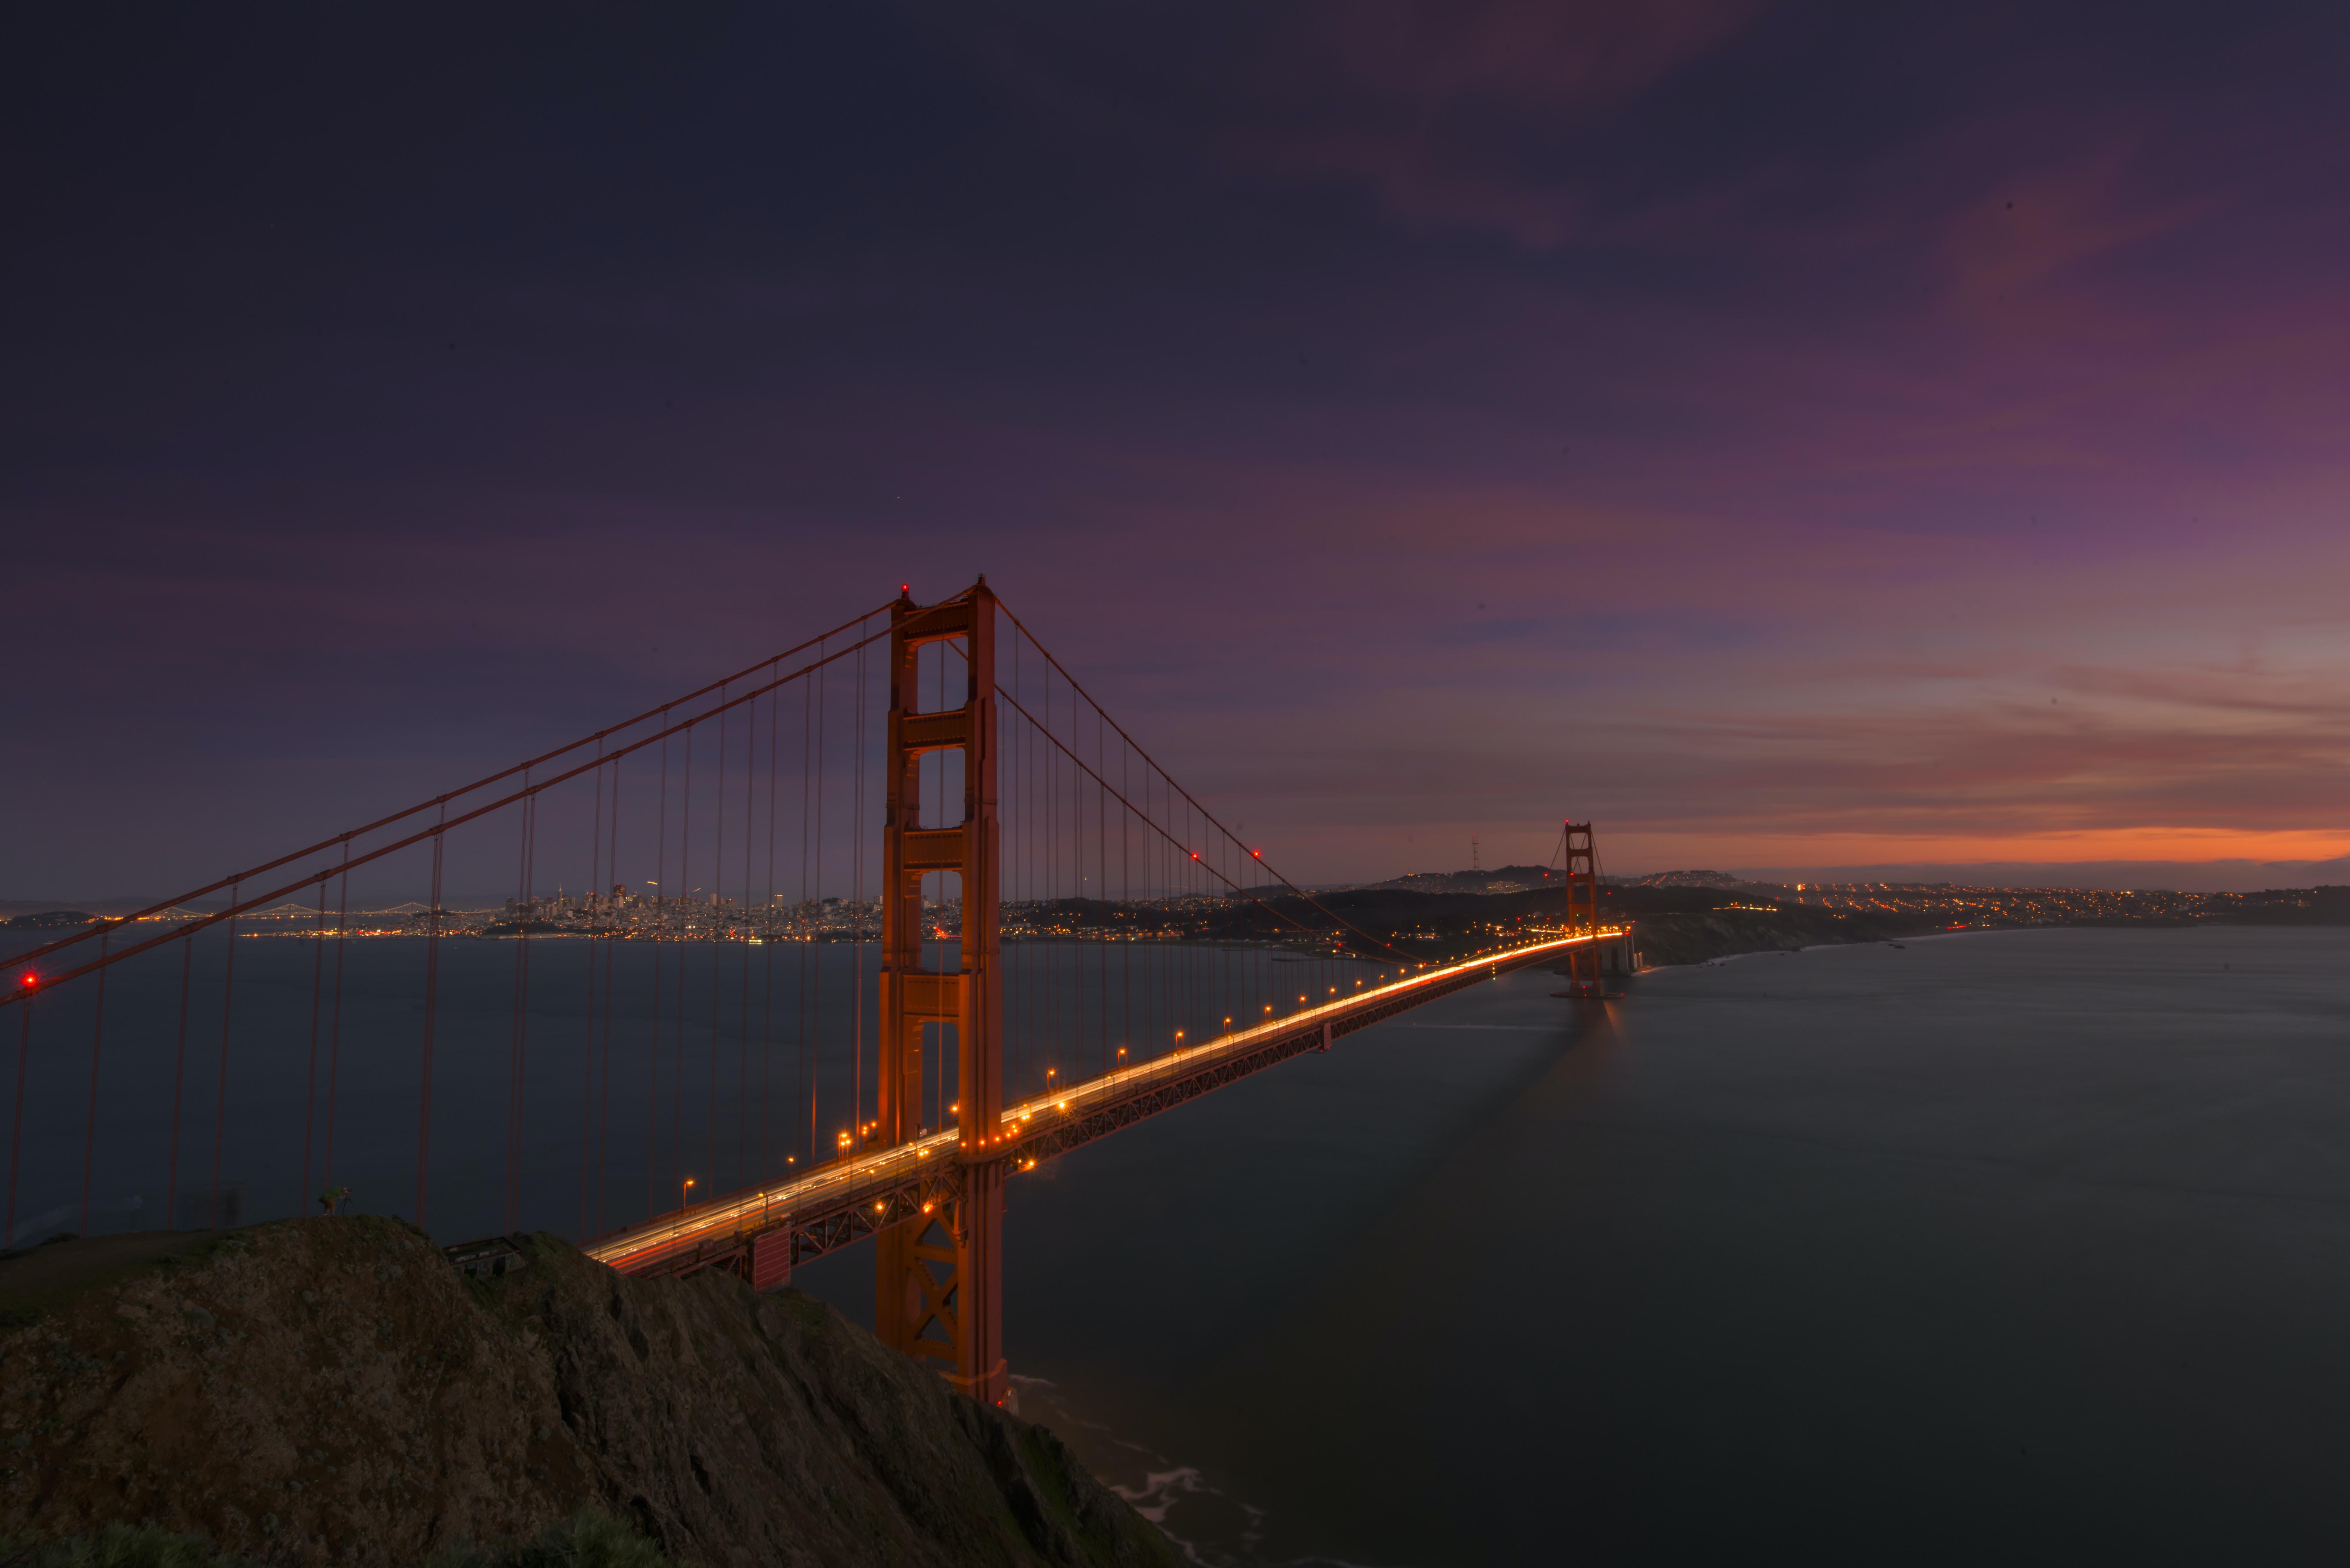 Golden Gate, California